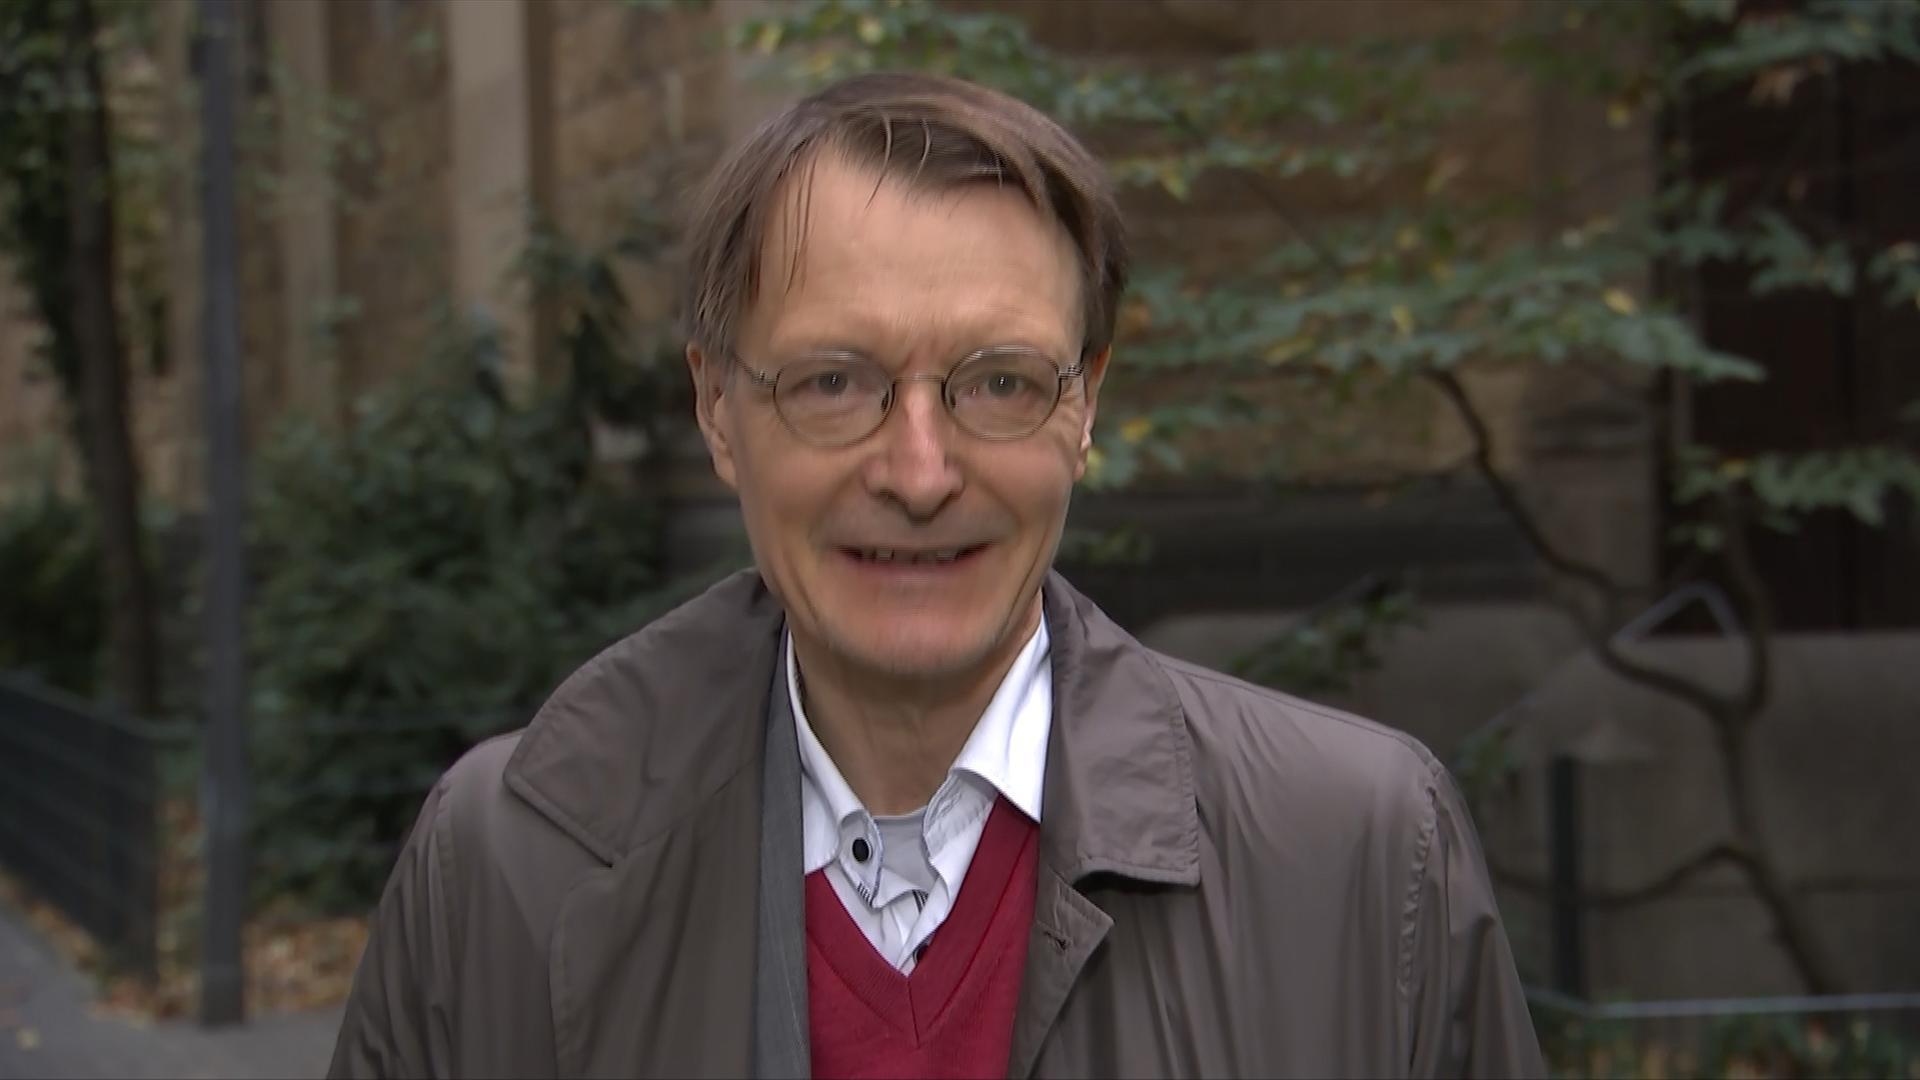 Lauterbach Fordert Feste Obergrenzen Bei Privaten Feiern Zdfheute